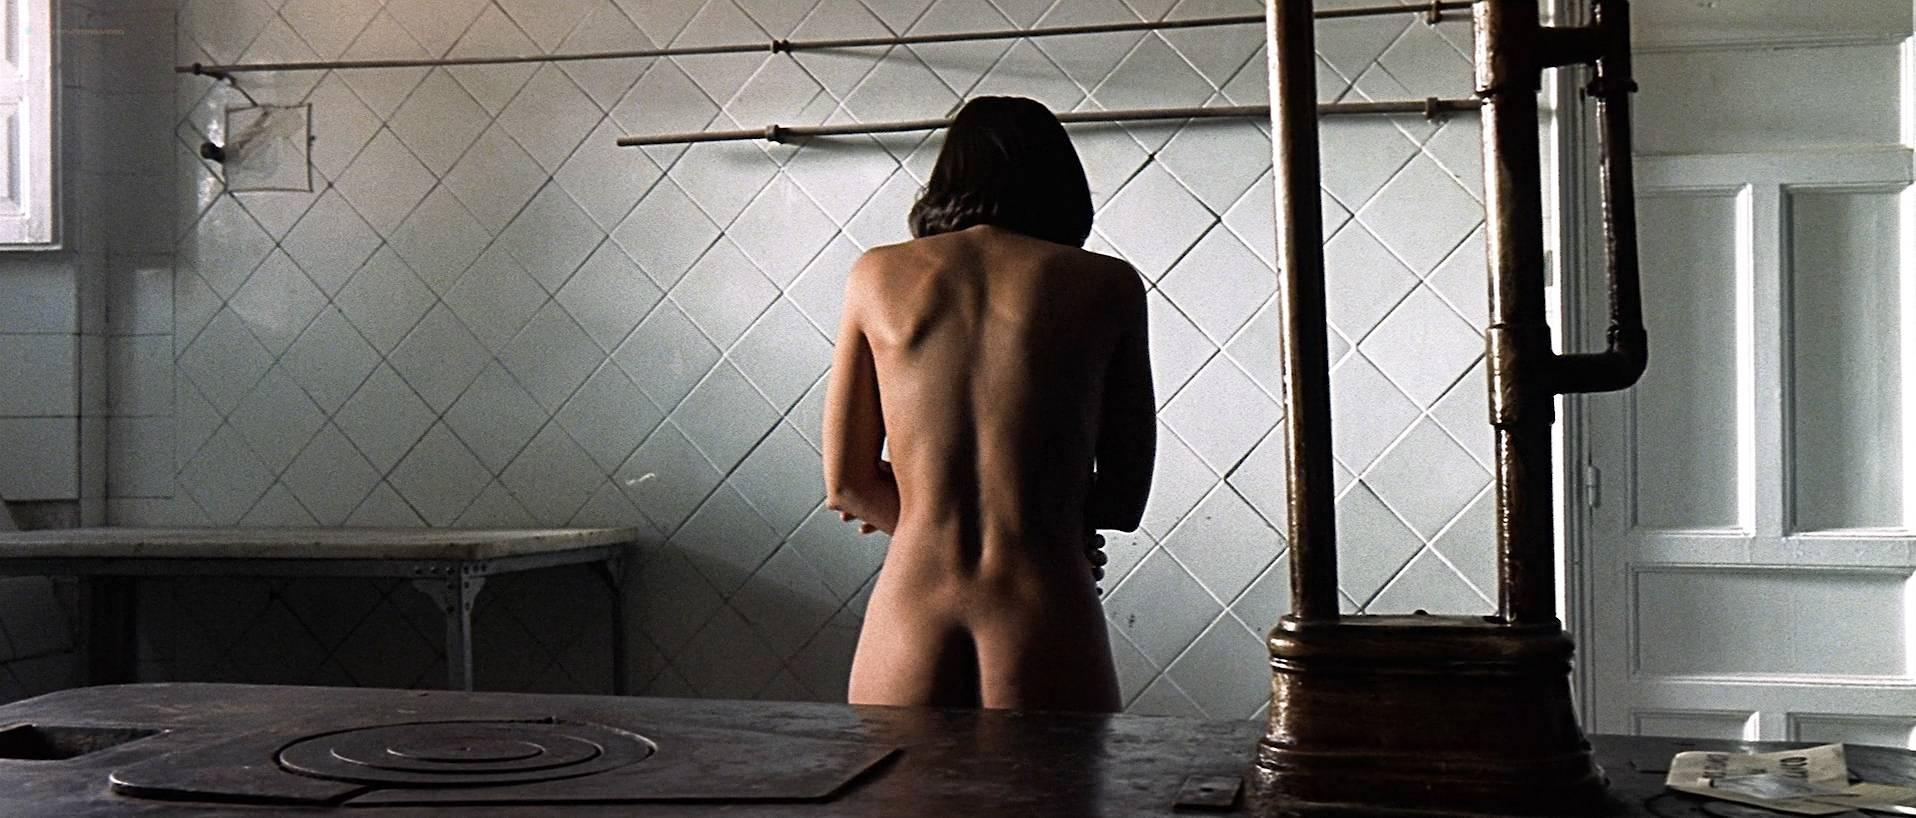 Verónica Sánchez nude topless and butt - Las 13 rosas (ES-2007) HD 1080p BluRay (8)